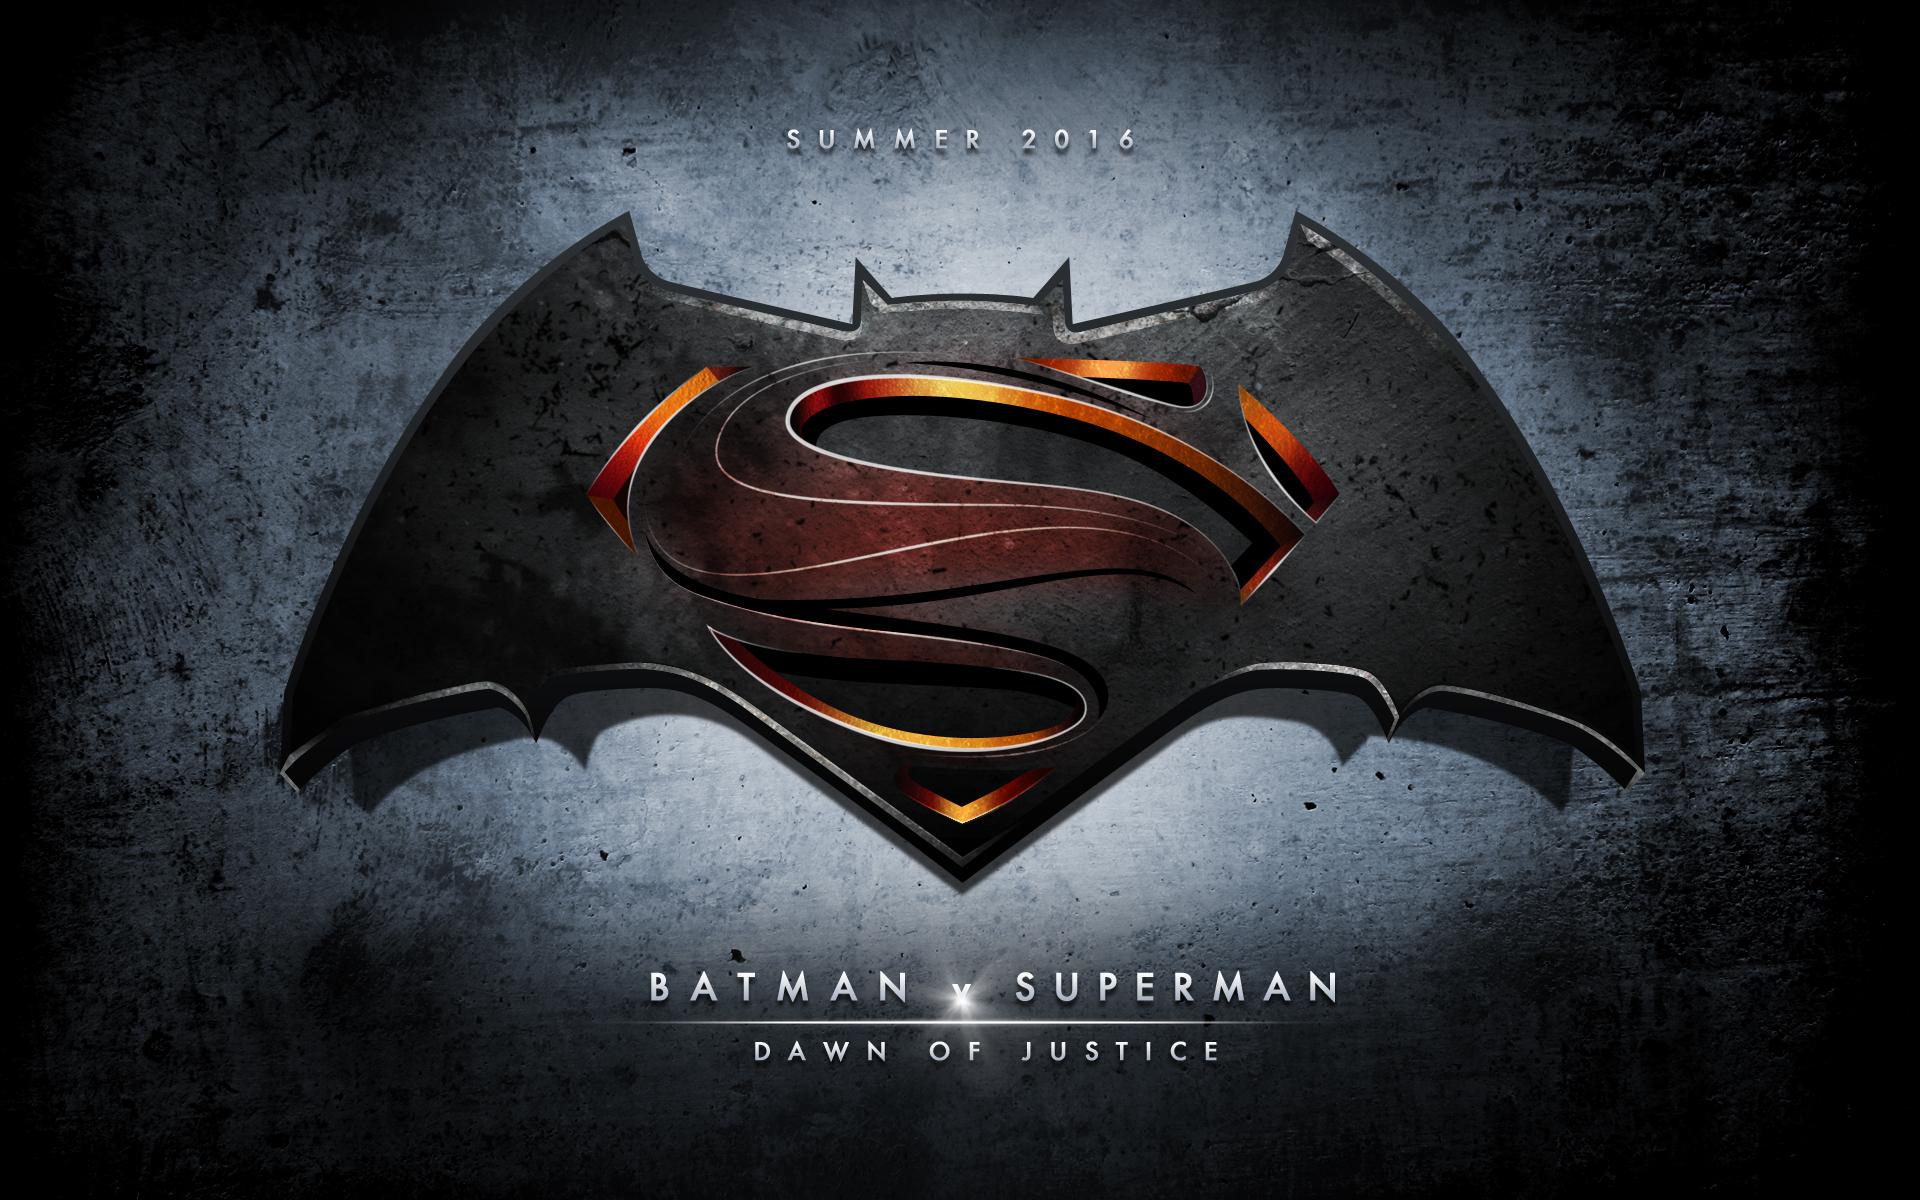 Batman vs superman the good the bad and the ugly with amy salazar biocorpaavc Choice Image